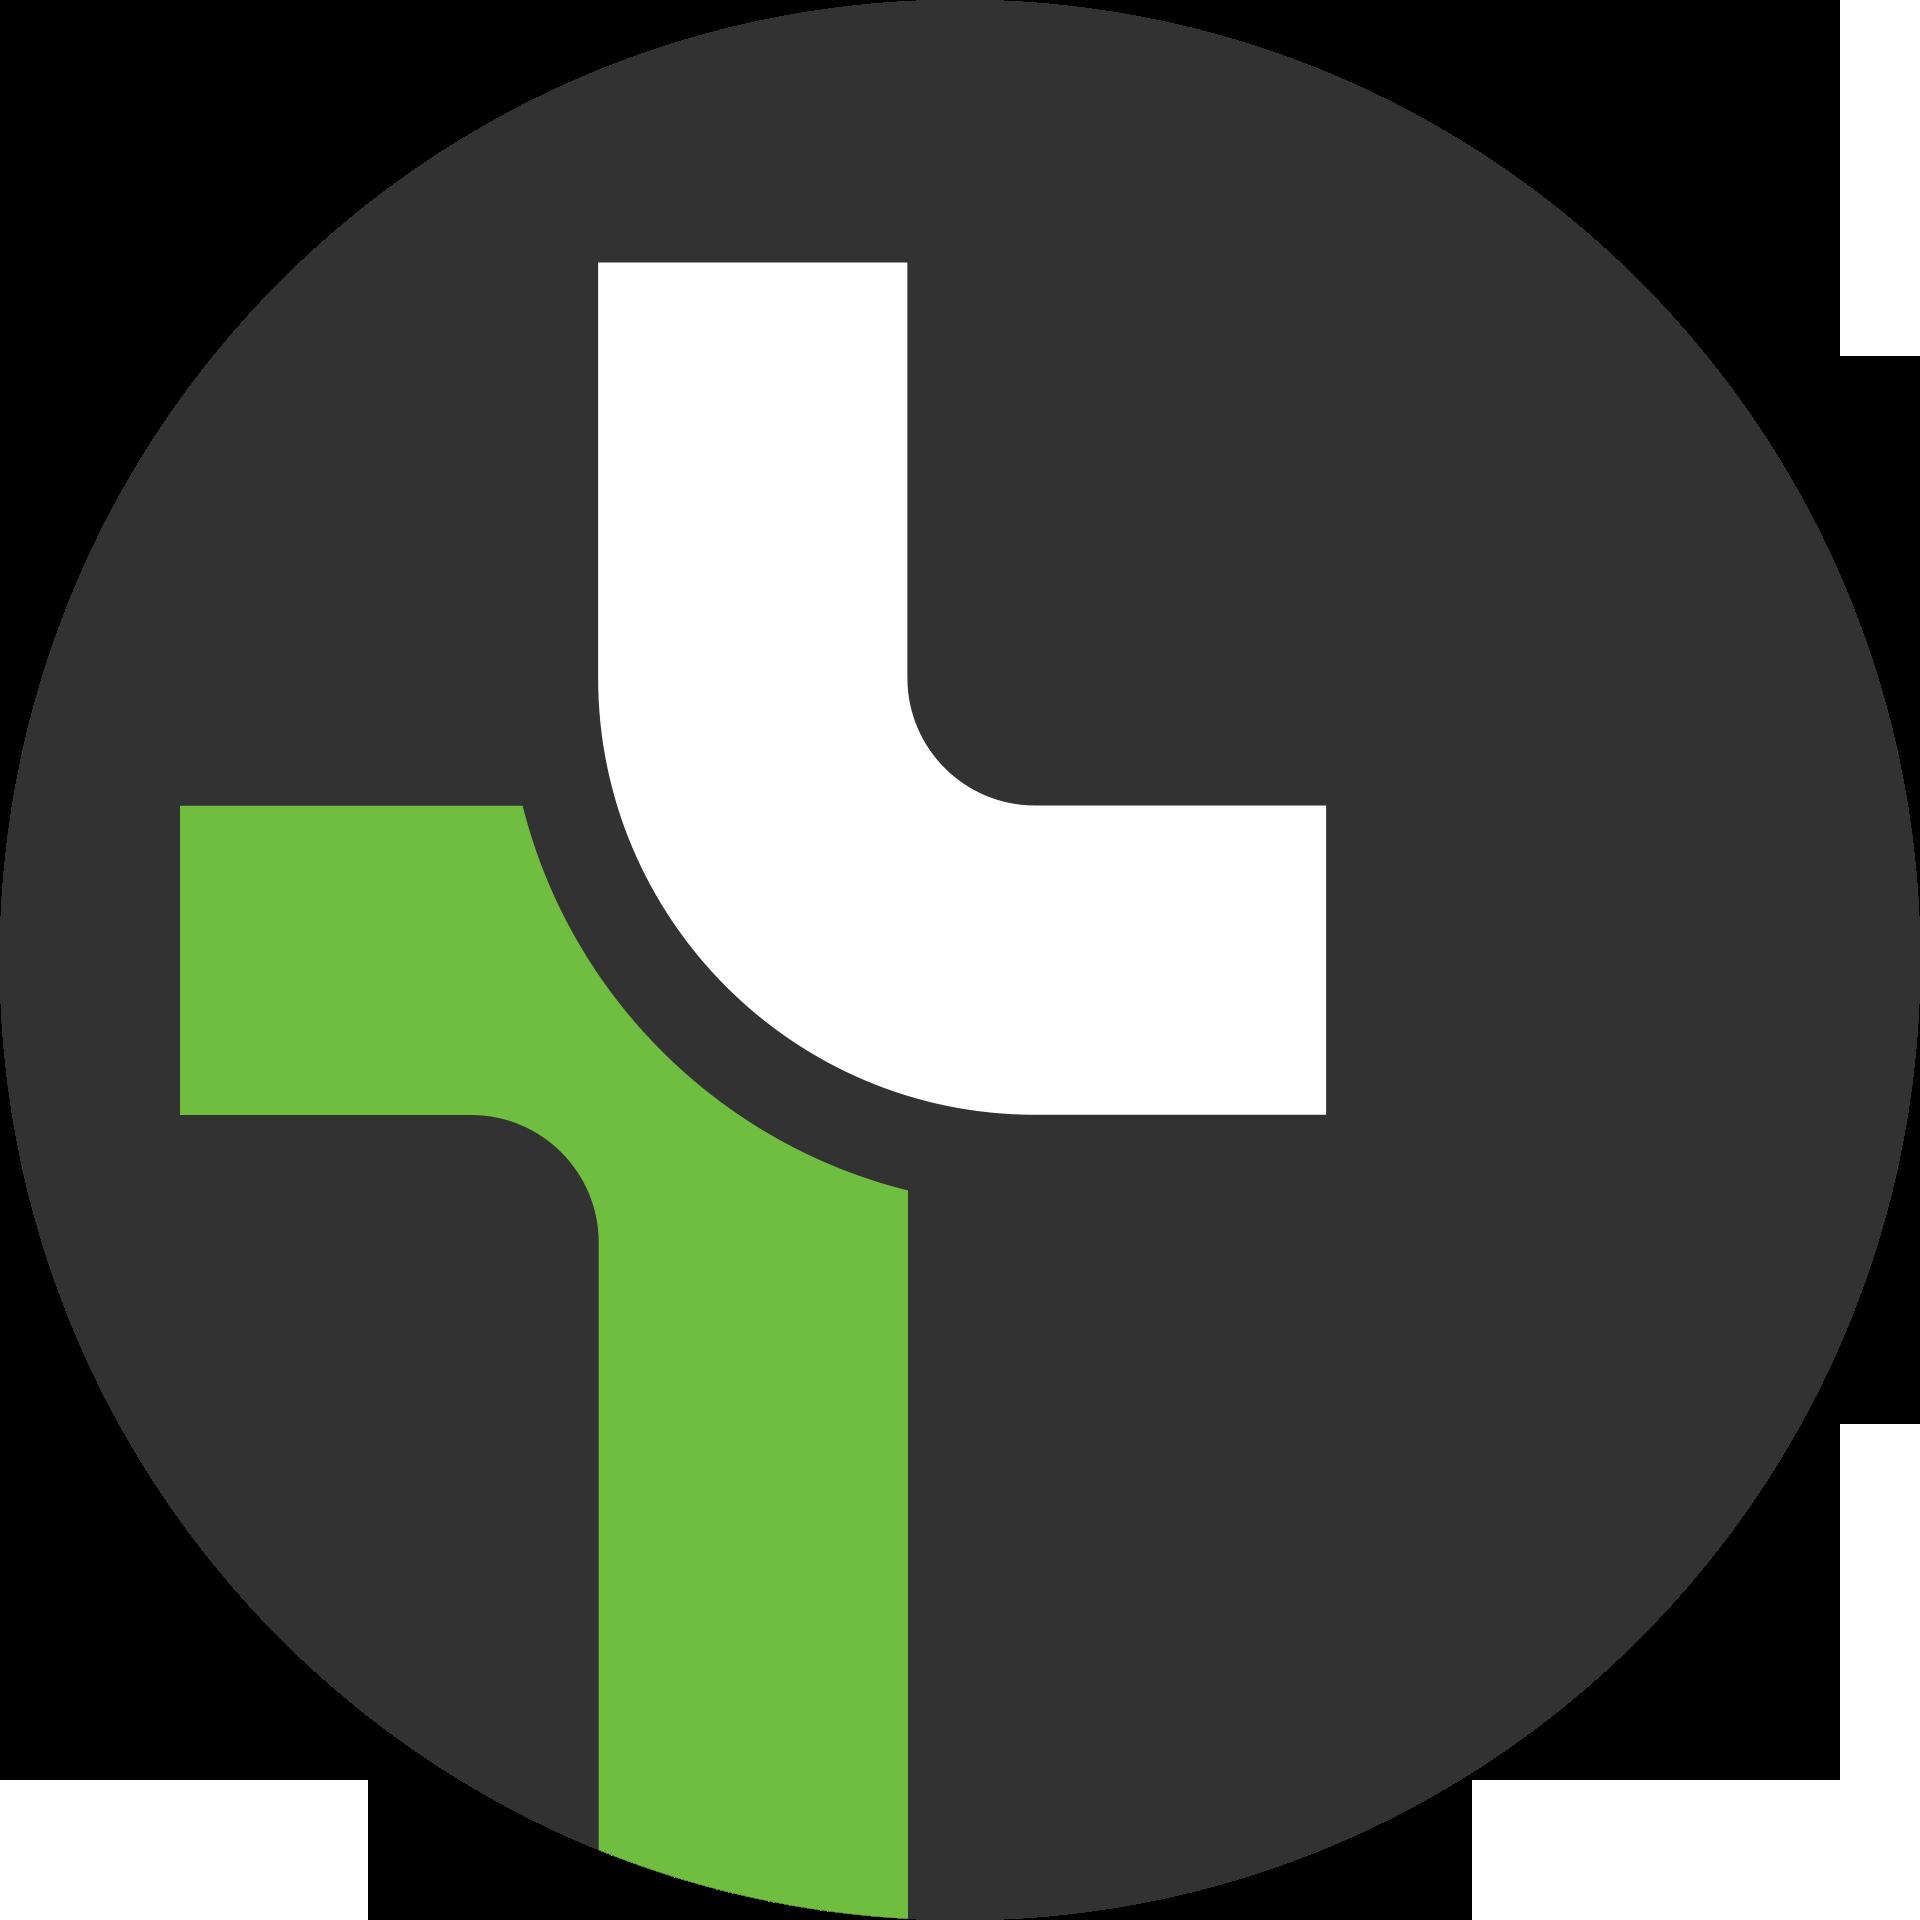 graphic-symbol-large.png